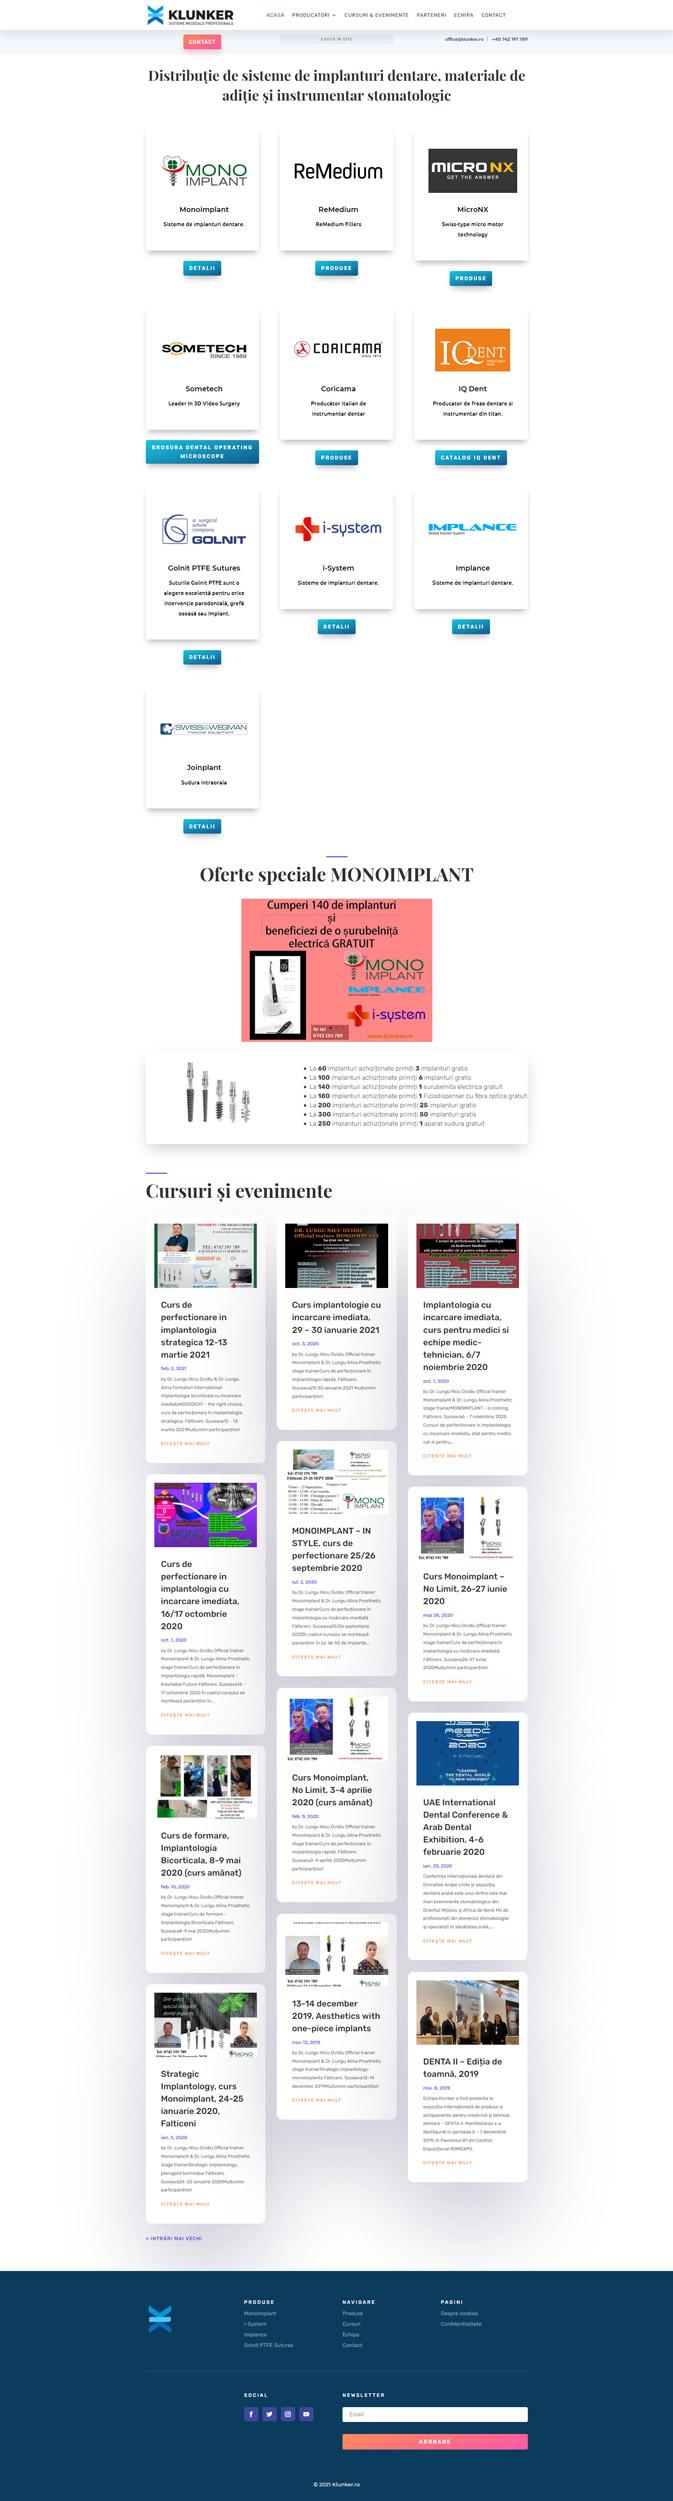 klunker.ro - Portofoliu design web Bitopia Falticeni